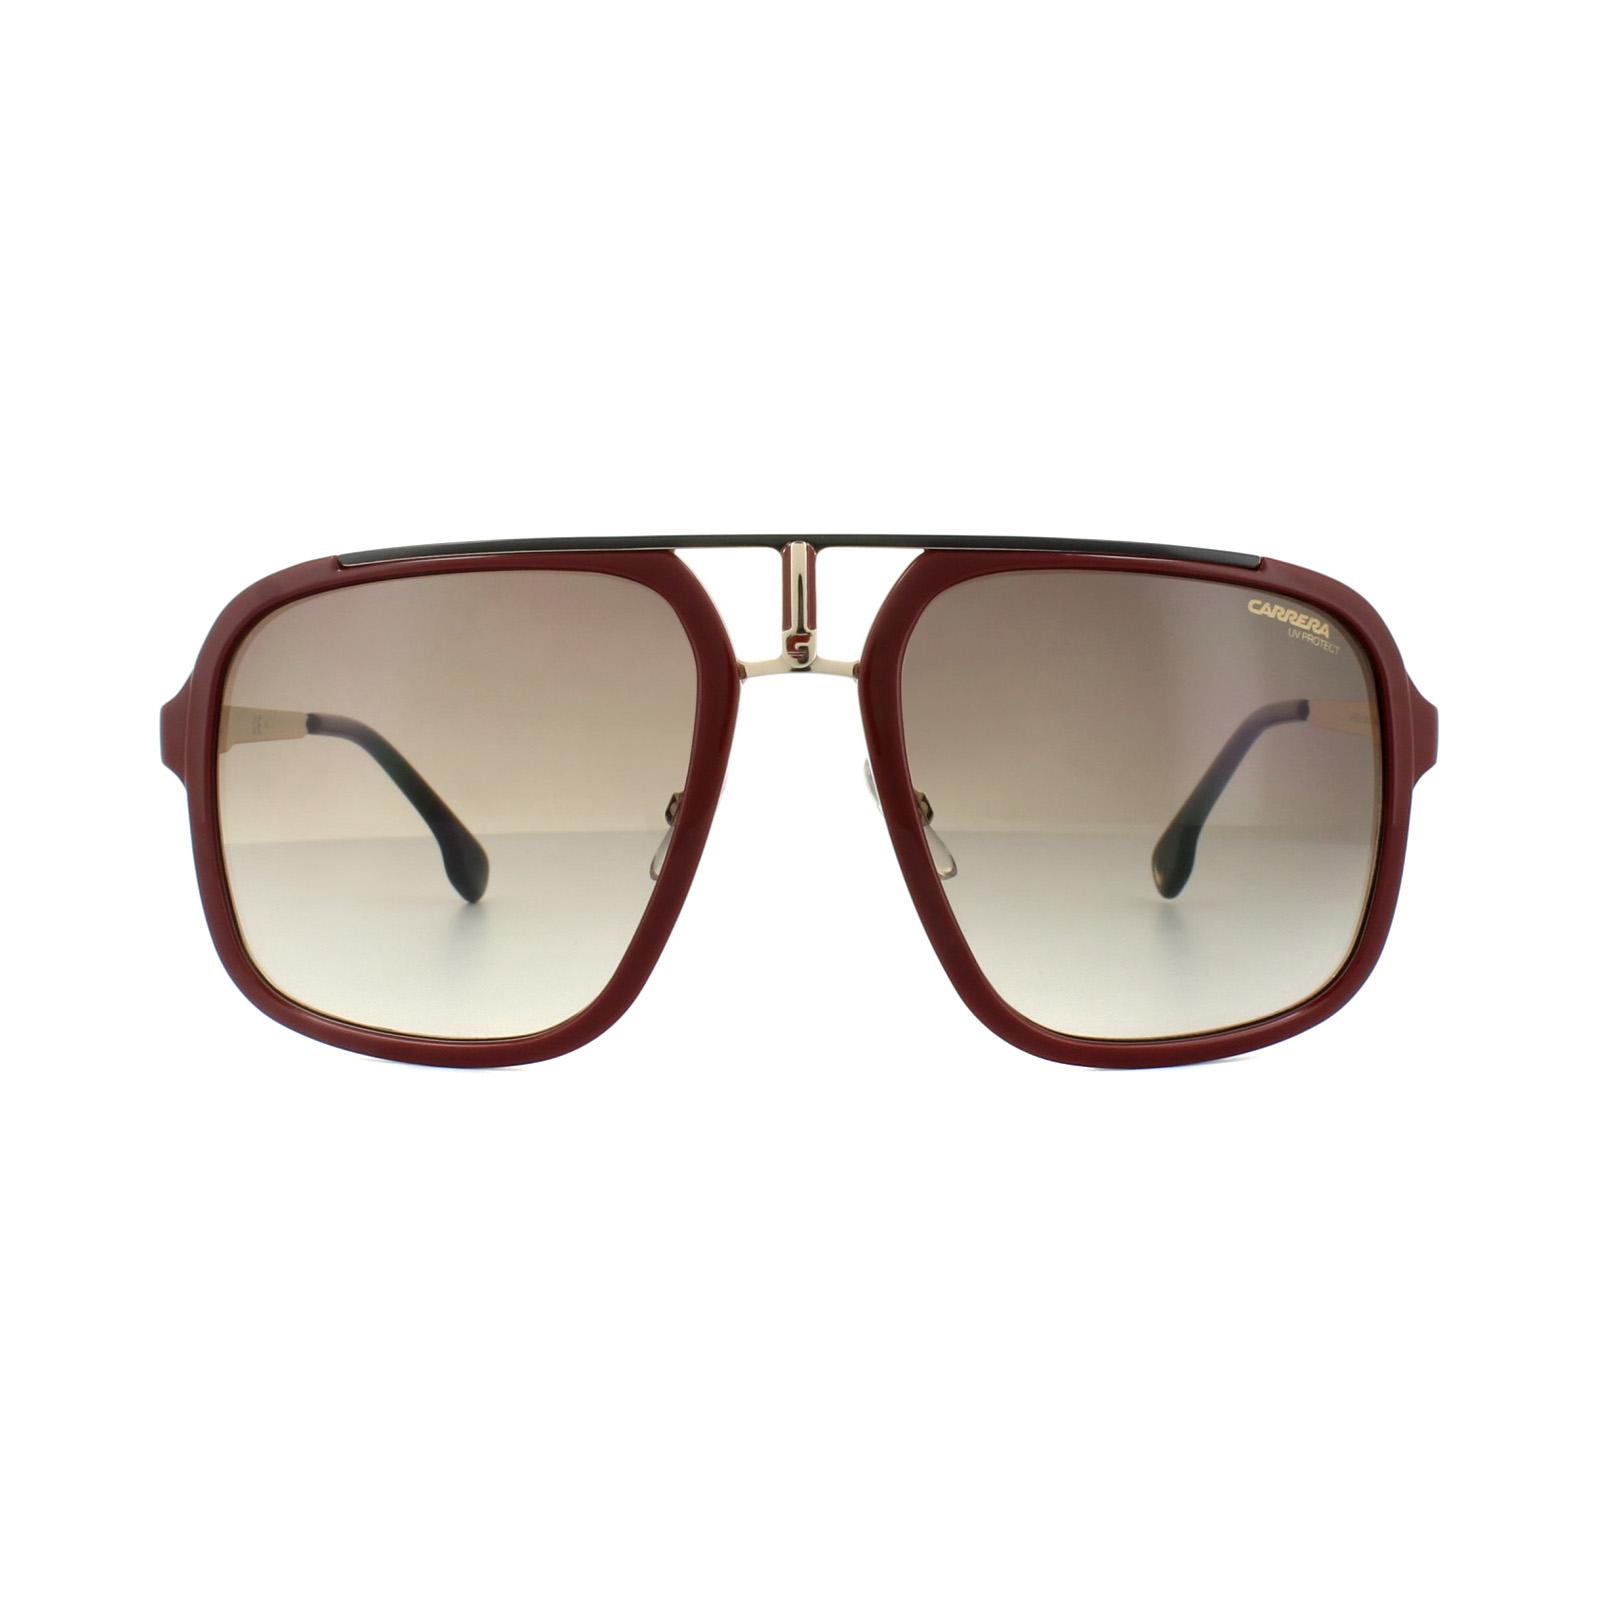 25797f6cb0d Cheap Carrera 1004 S Sunglasses - Discounted Sunglasses